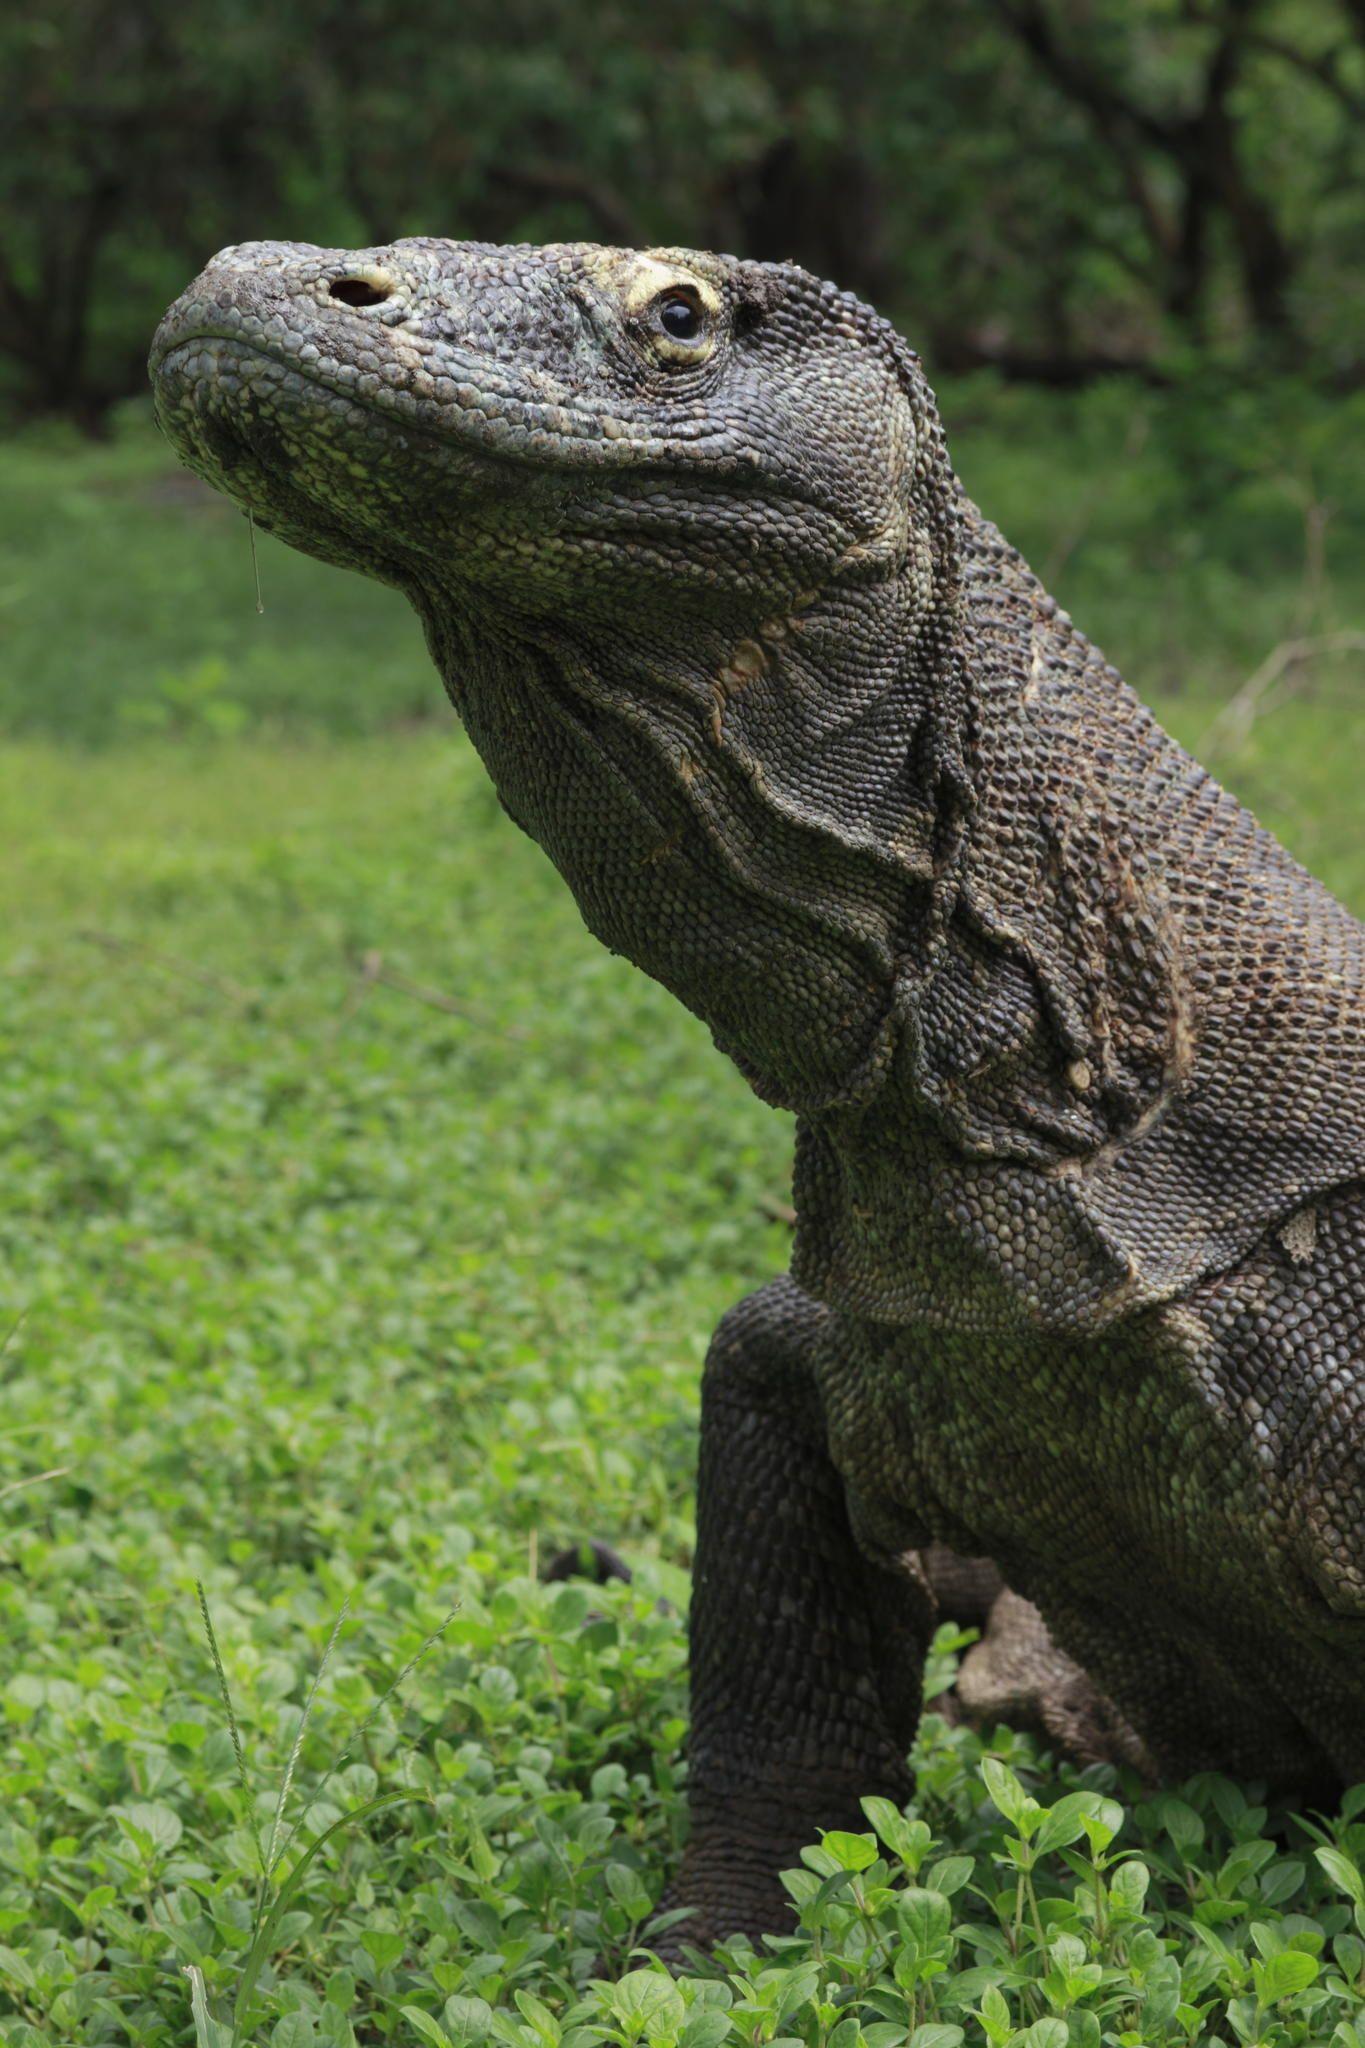 Komodo Dragon (Varanus komodoensis) | Reptiles | Pinterest | Dragons ...